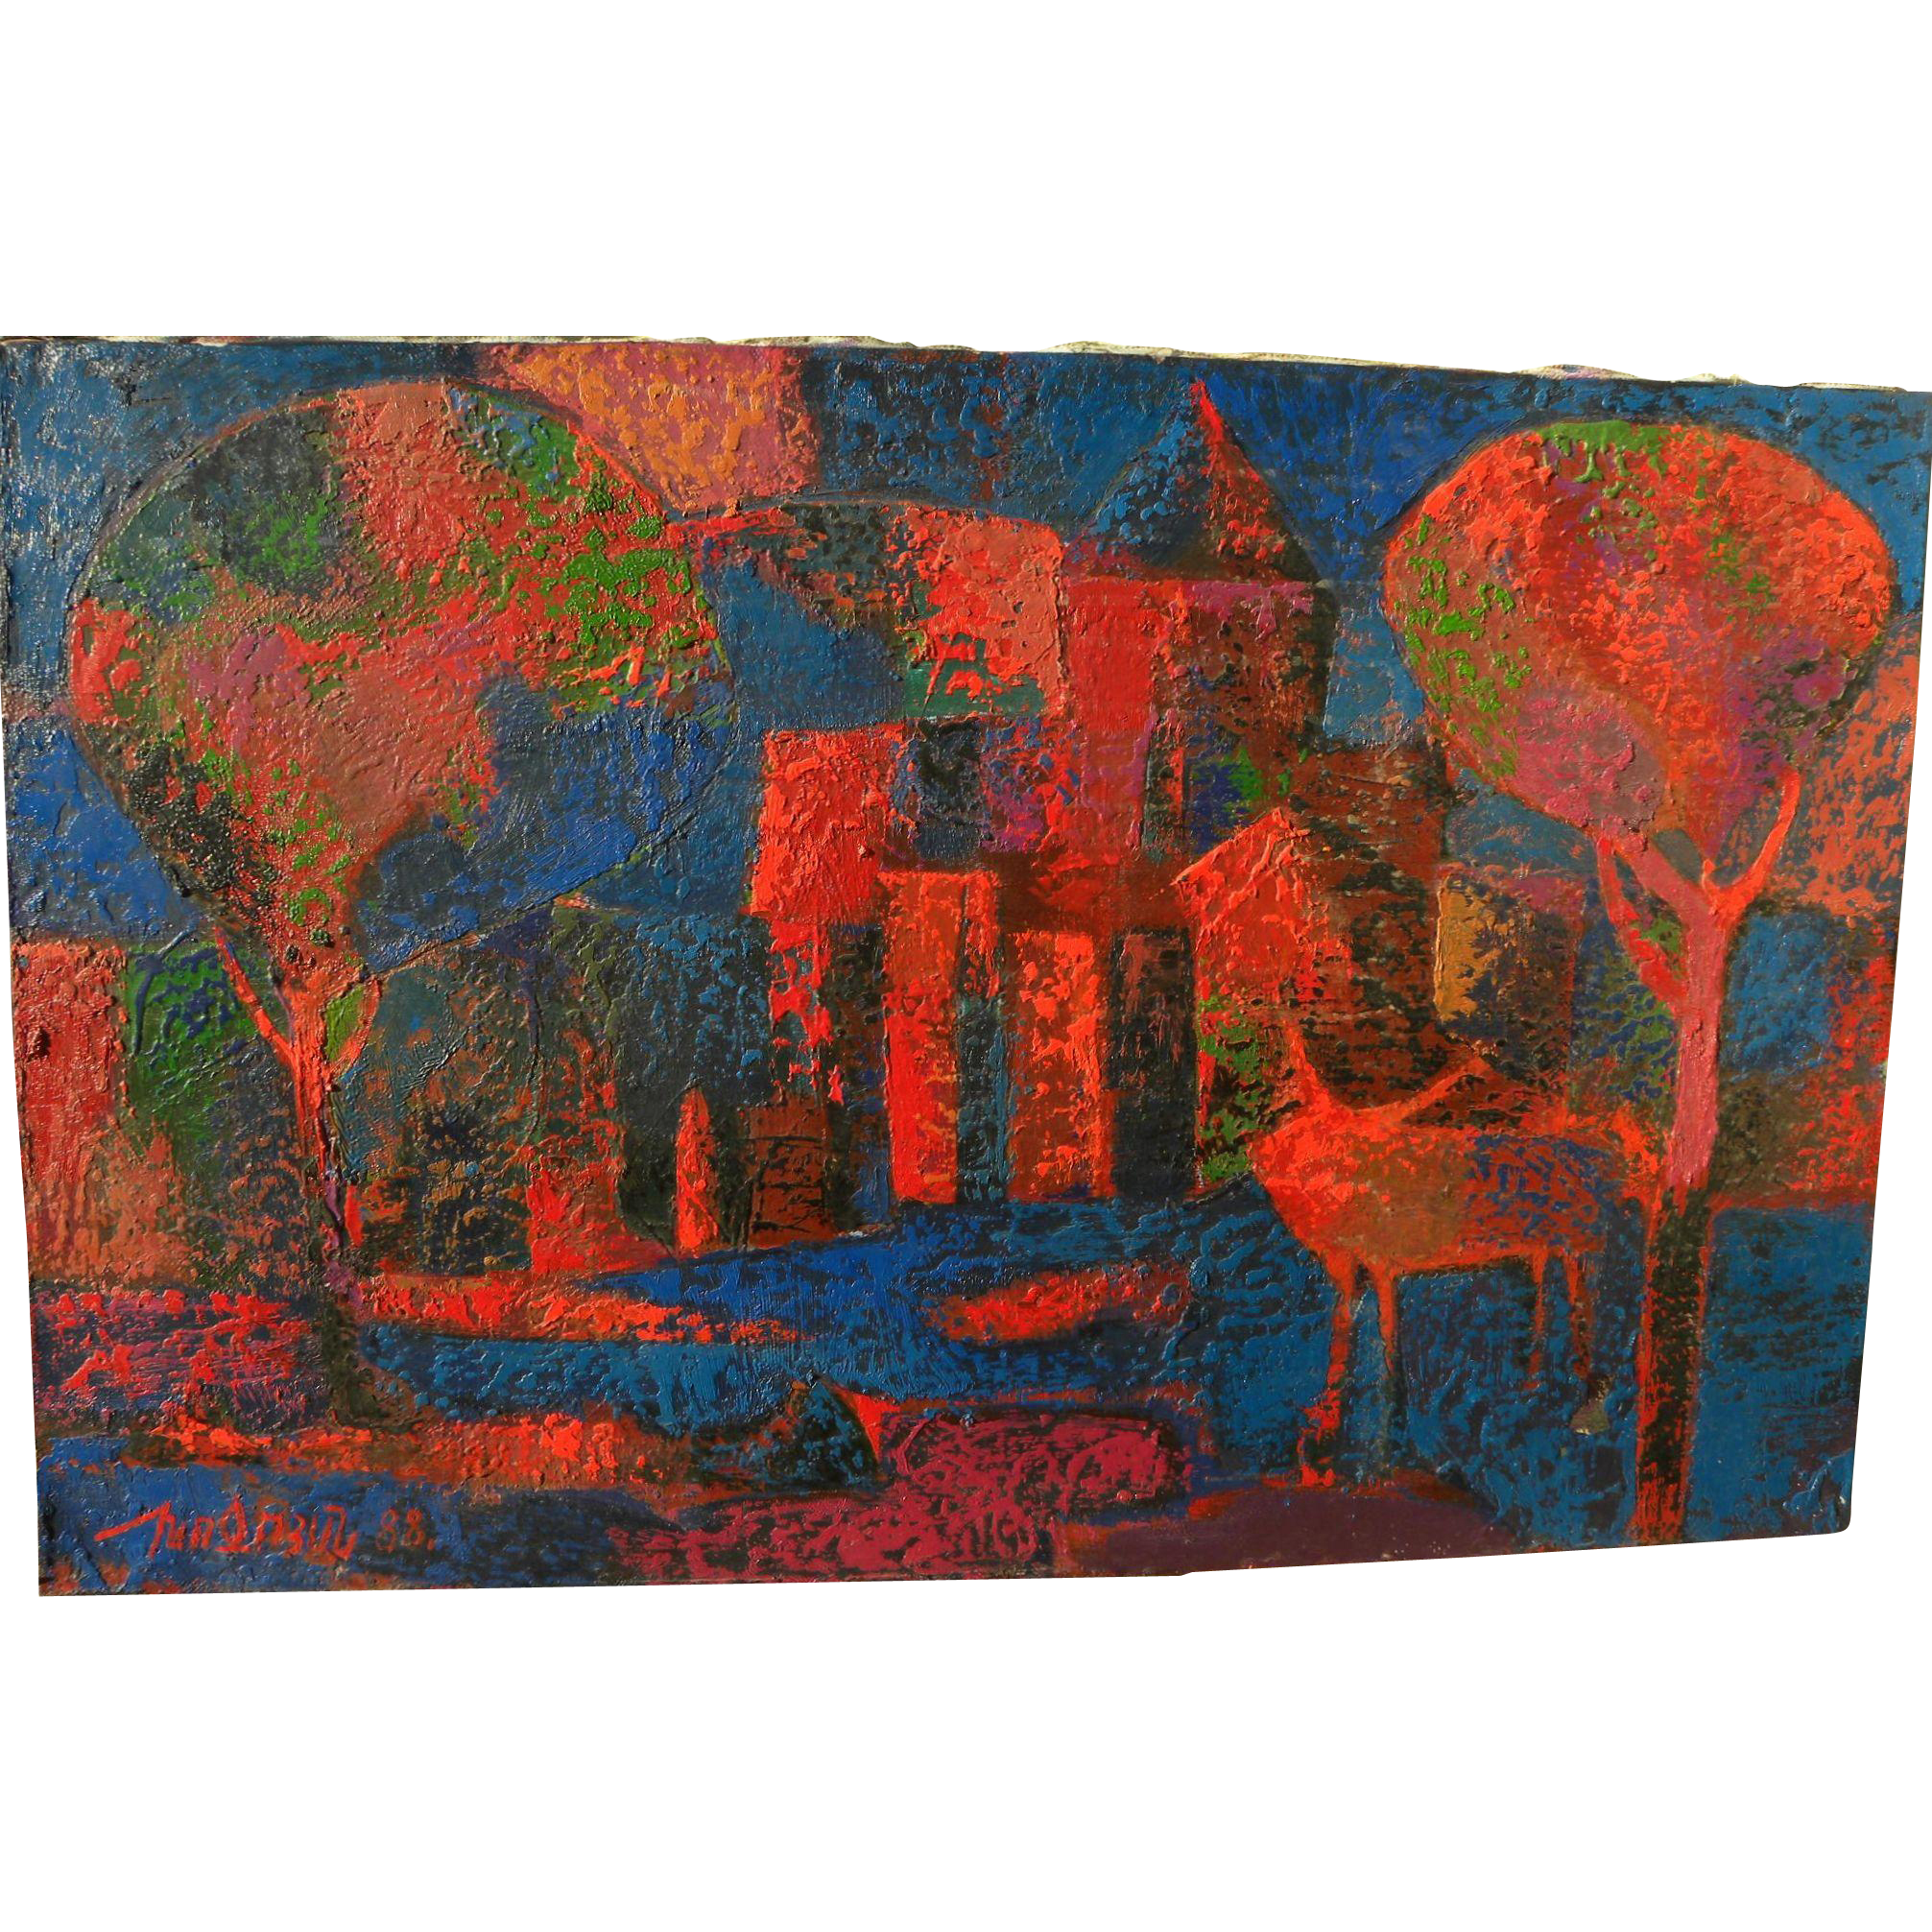 ARMEN KHOJOYAN (1959-) Armenian modernist semi-abstract 1988 painting by listed artist